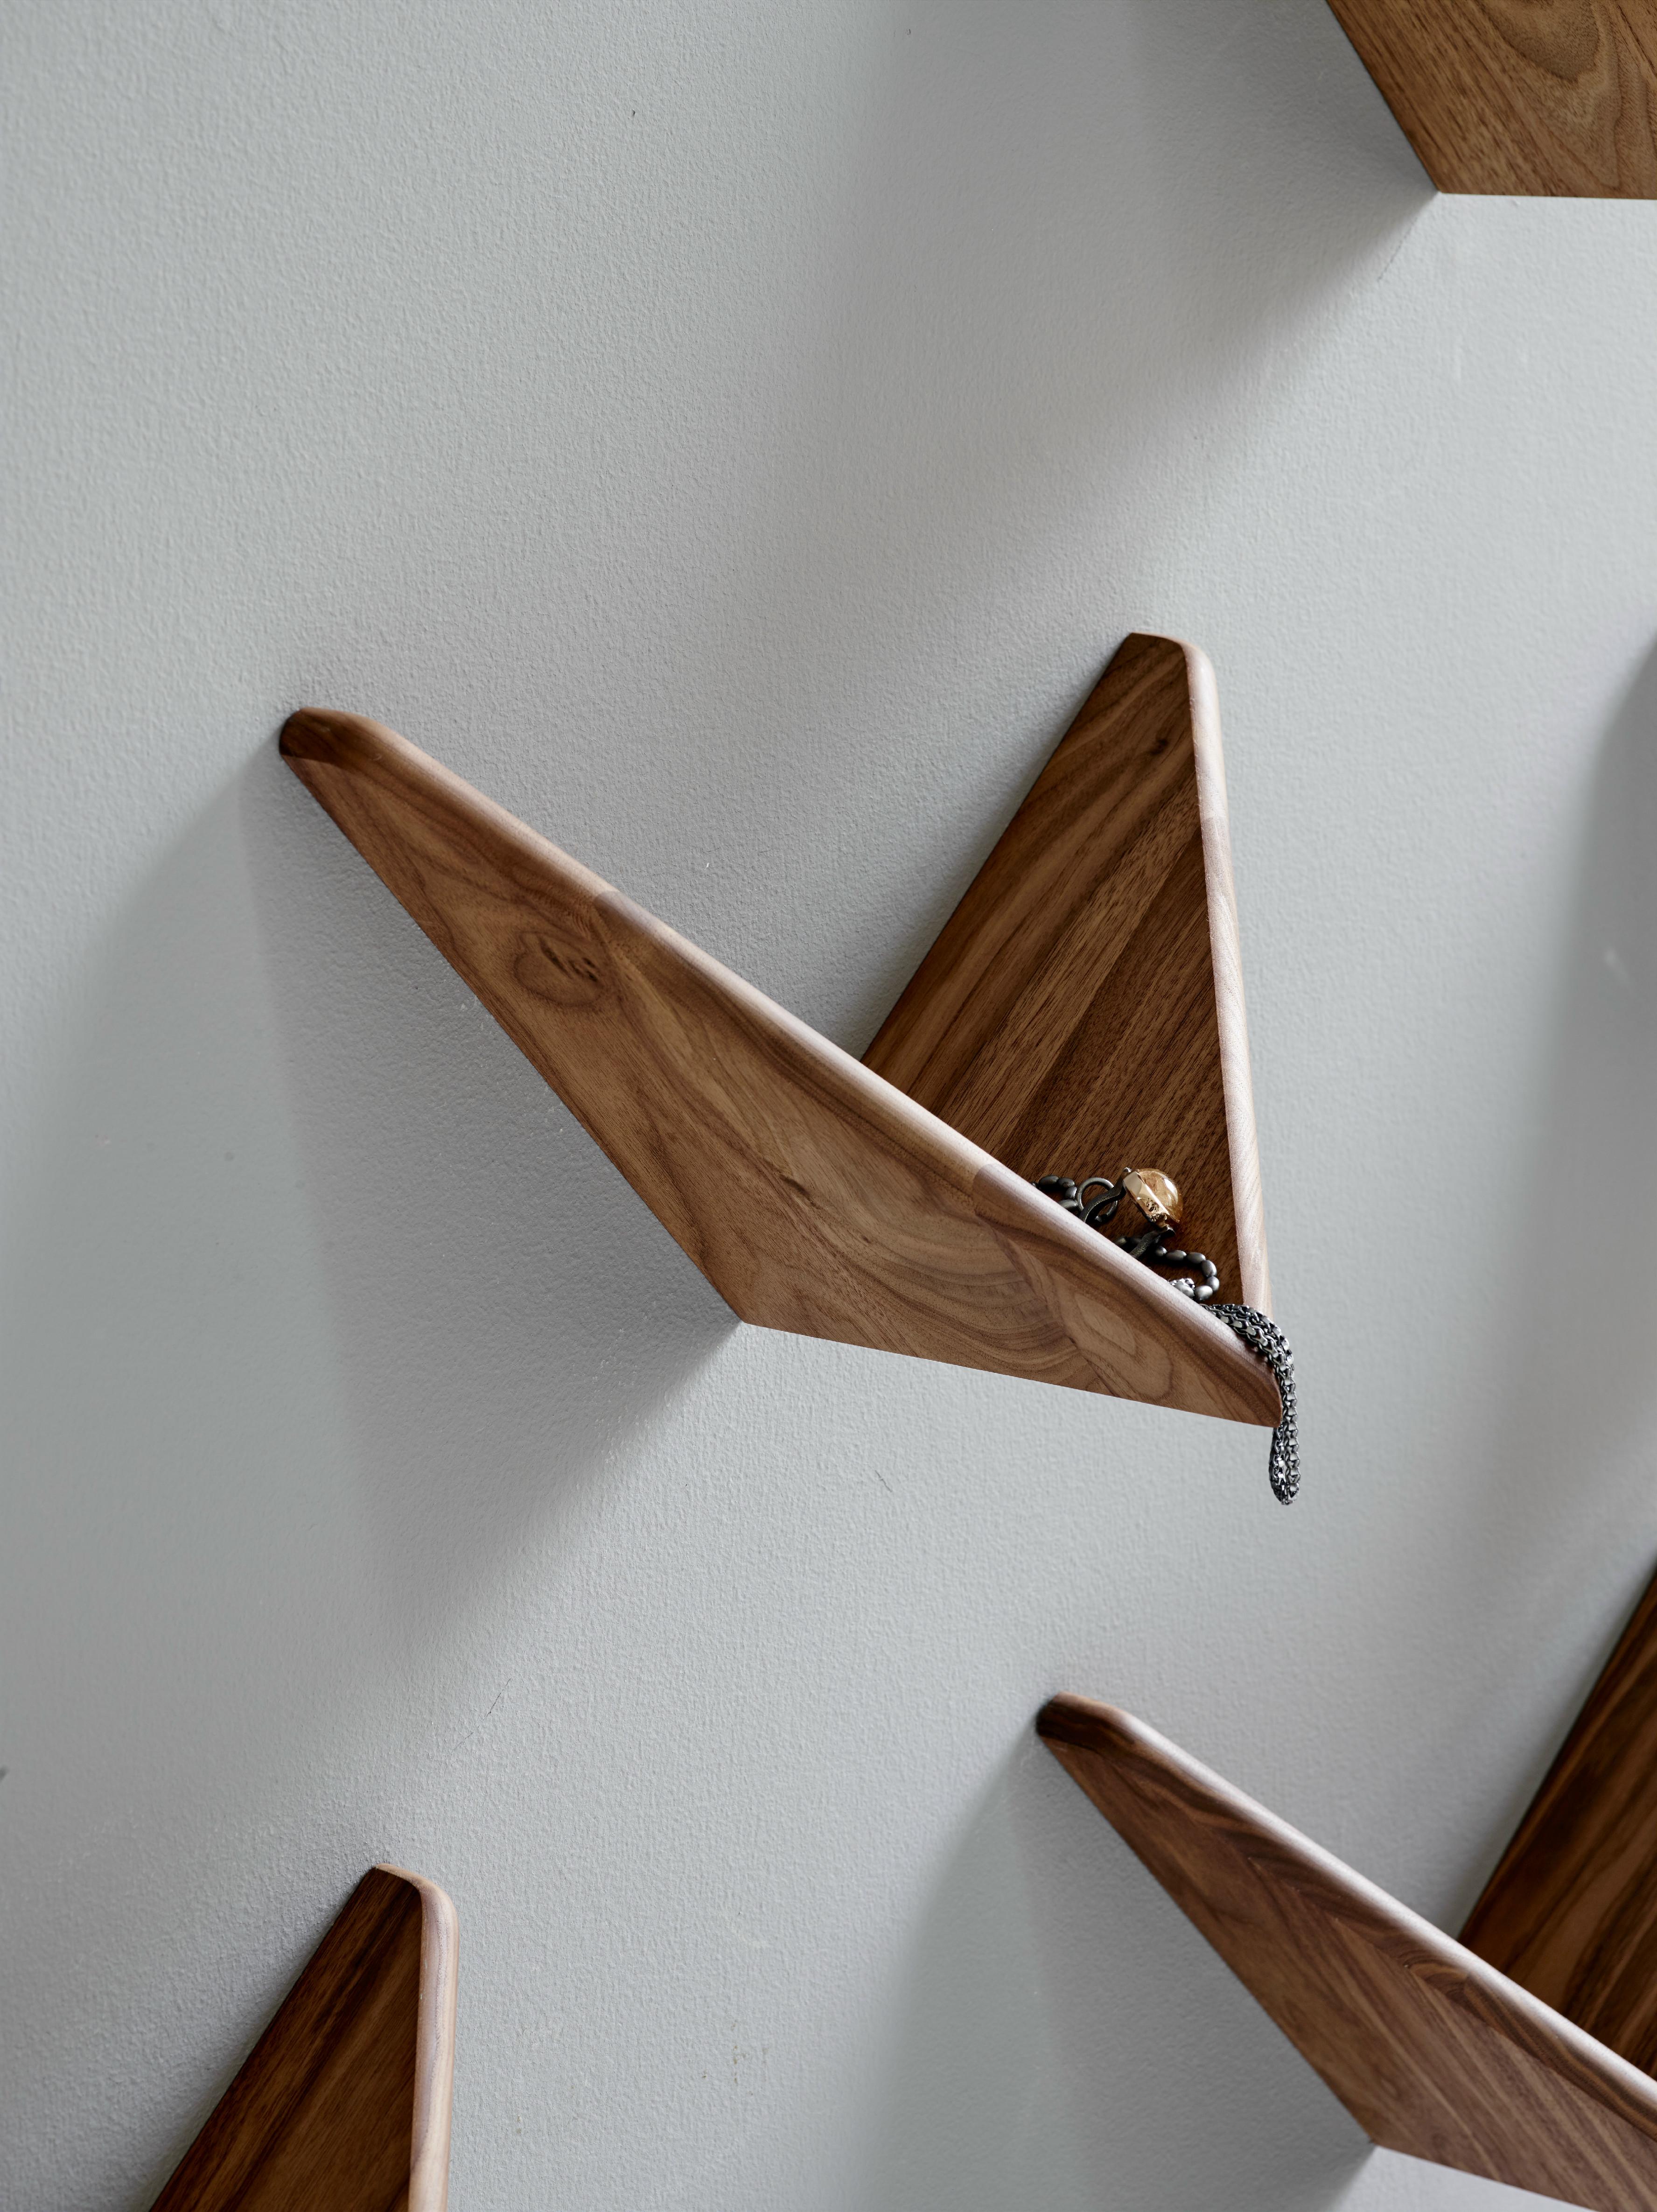 butterfly-shelf-entrance